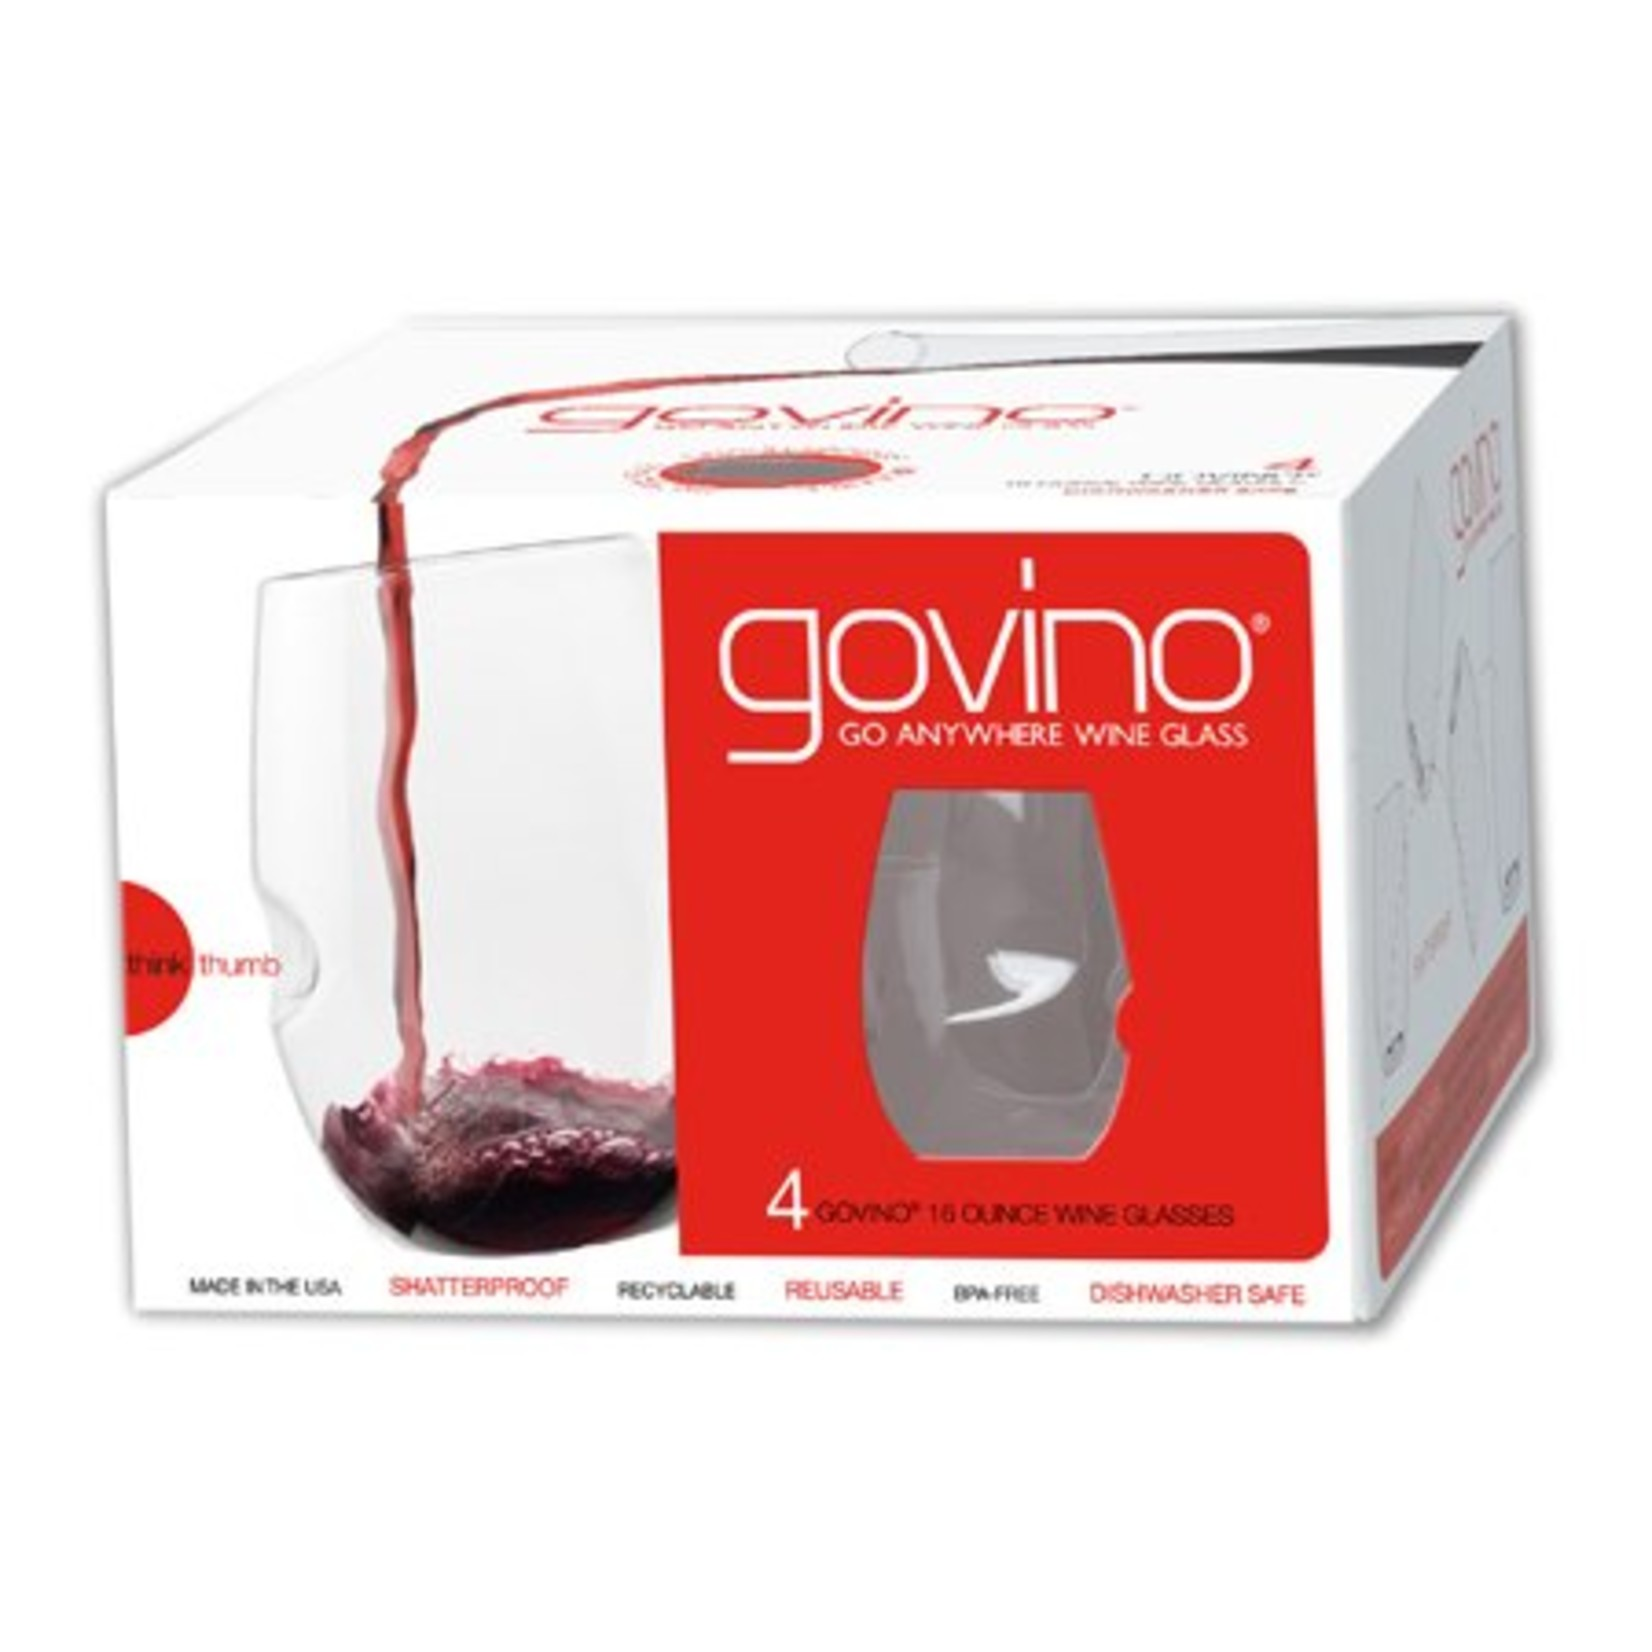 Govino 16oz Wine Glass 4 Pack